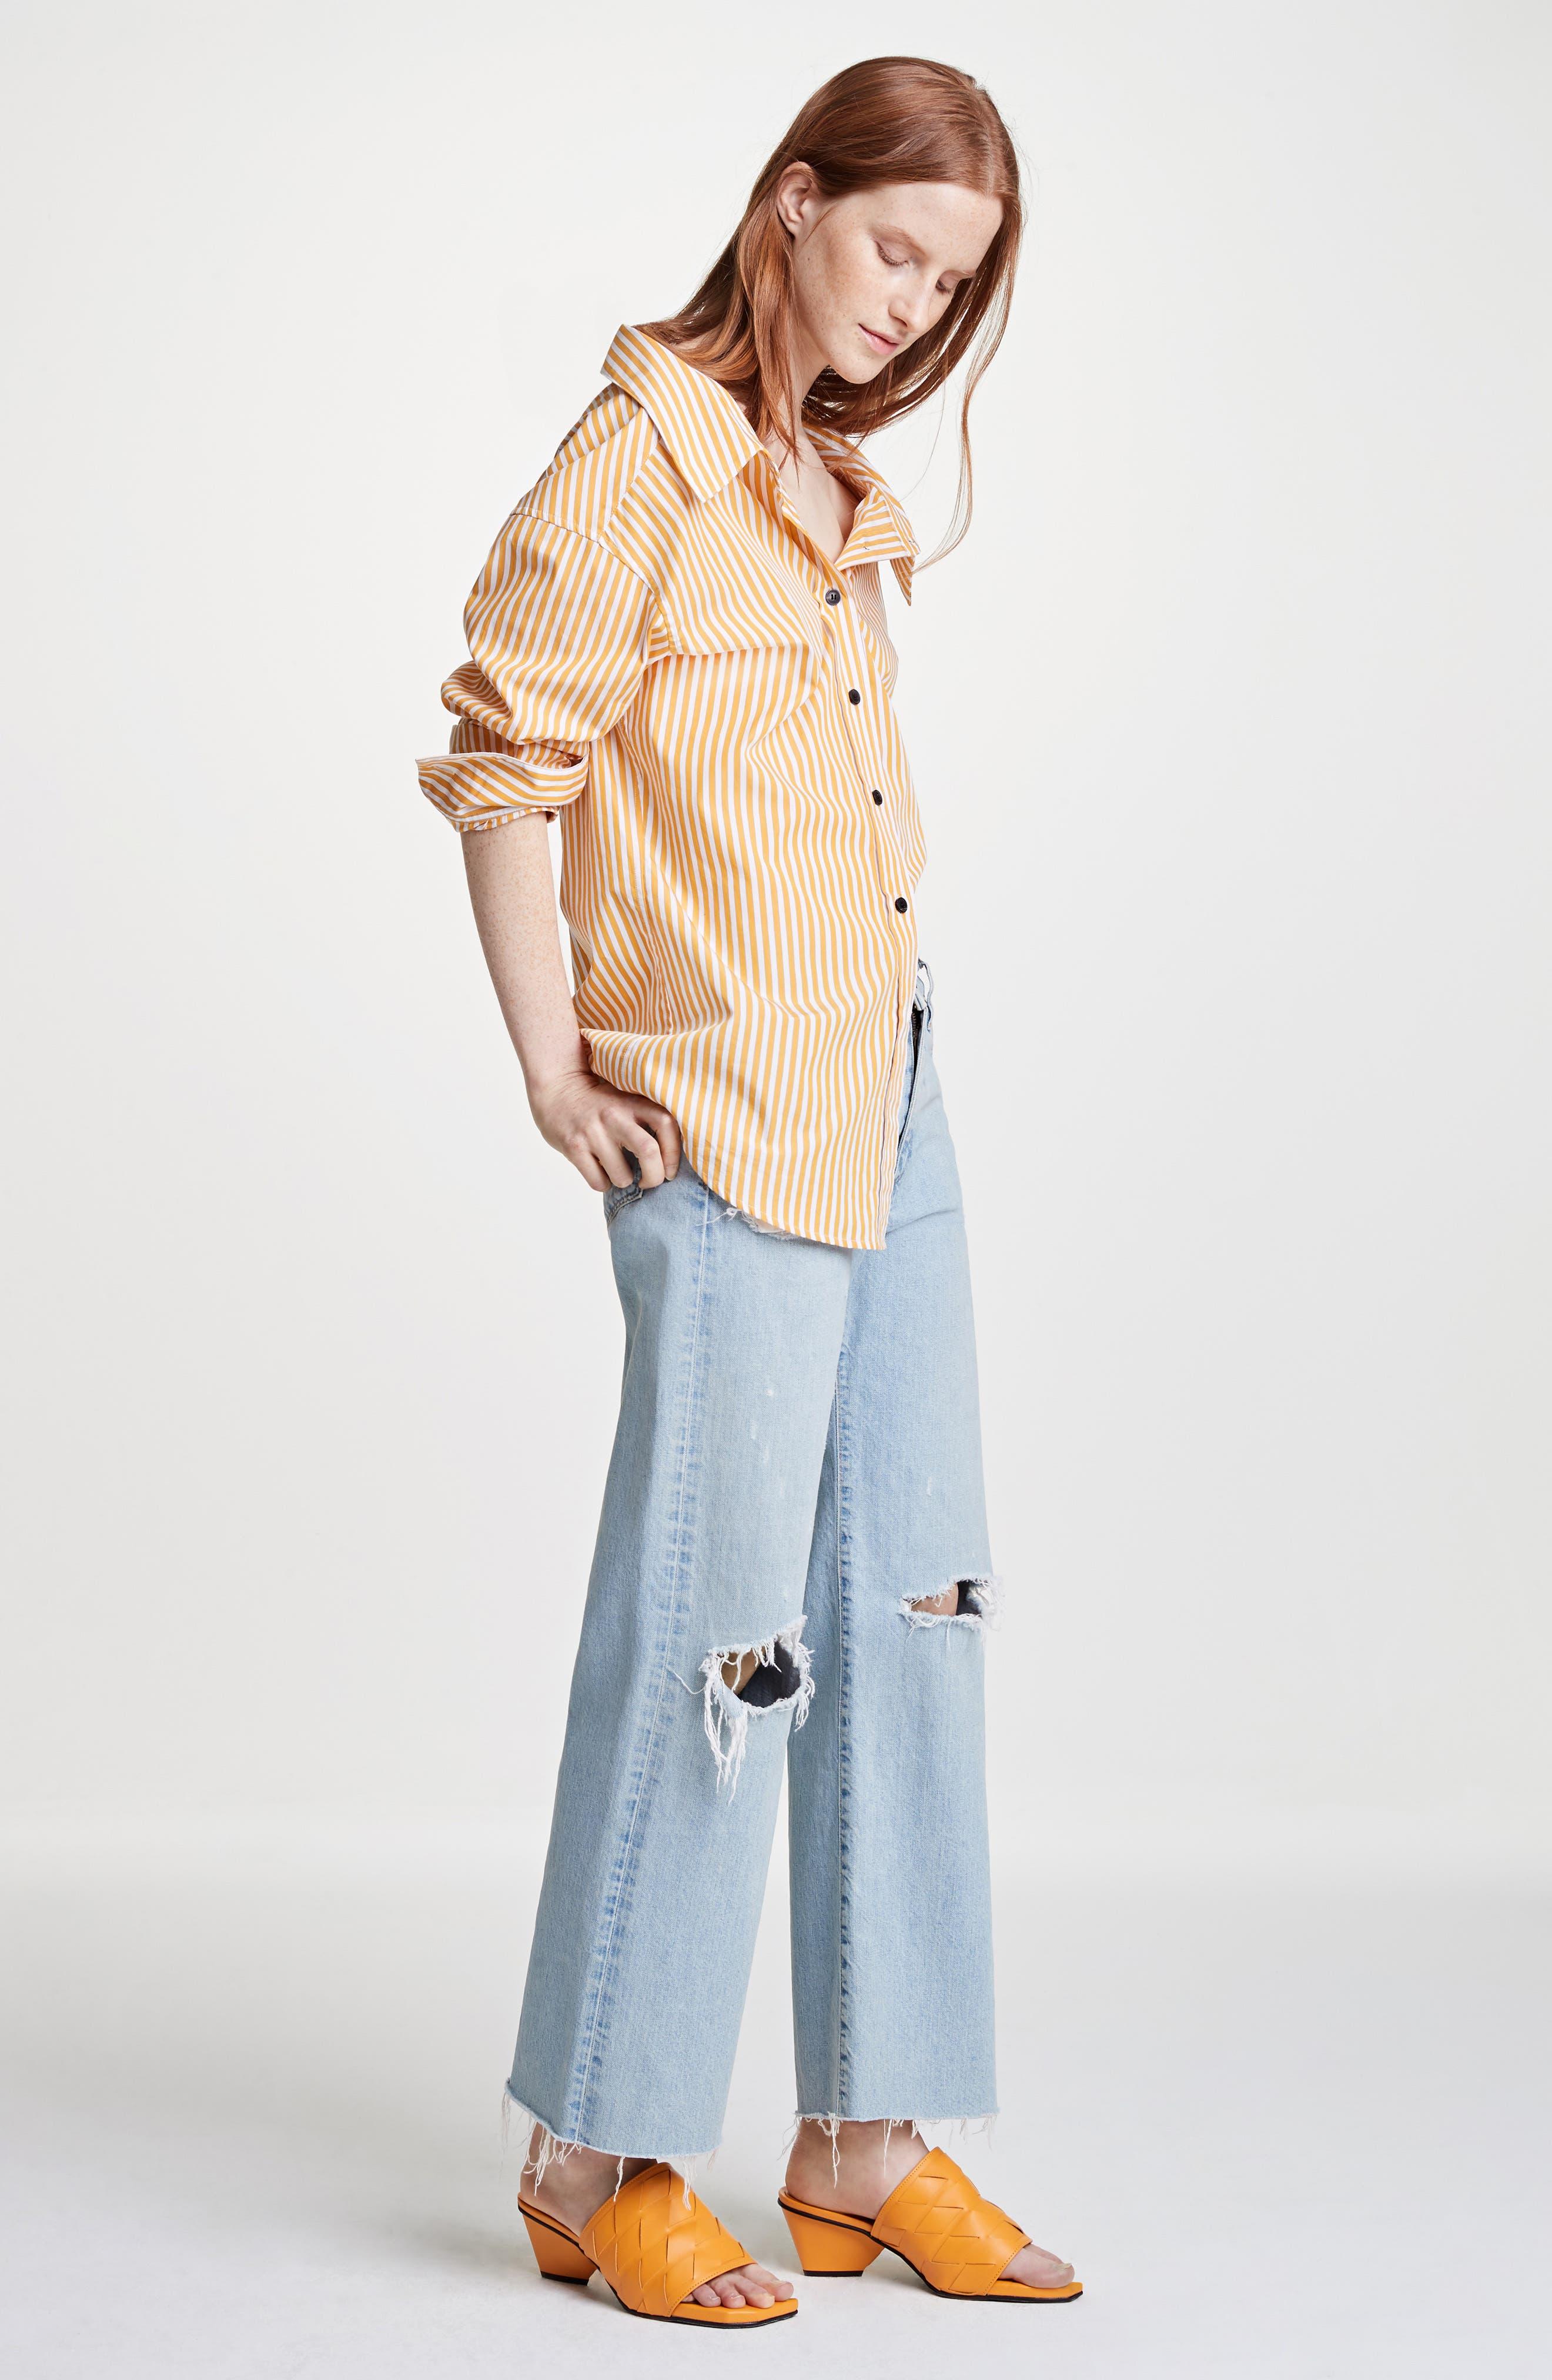 Tibbee Ripped Jeans,                             Alternate thumbnail 2, color,                             Light Indigo